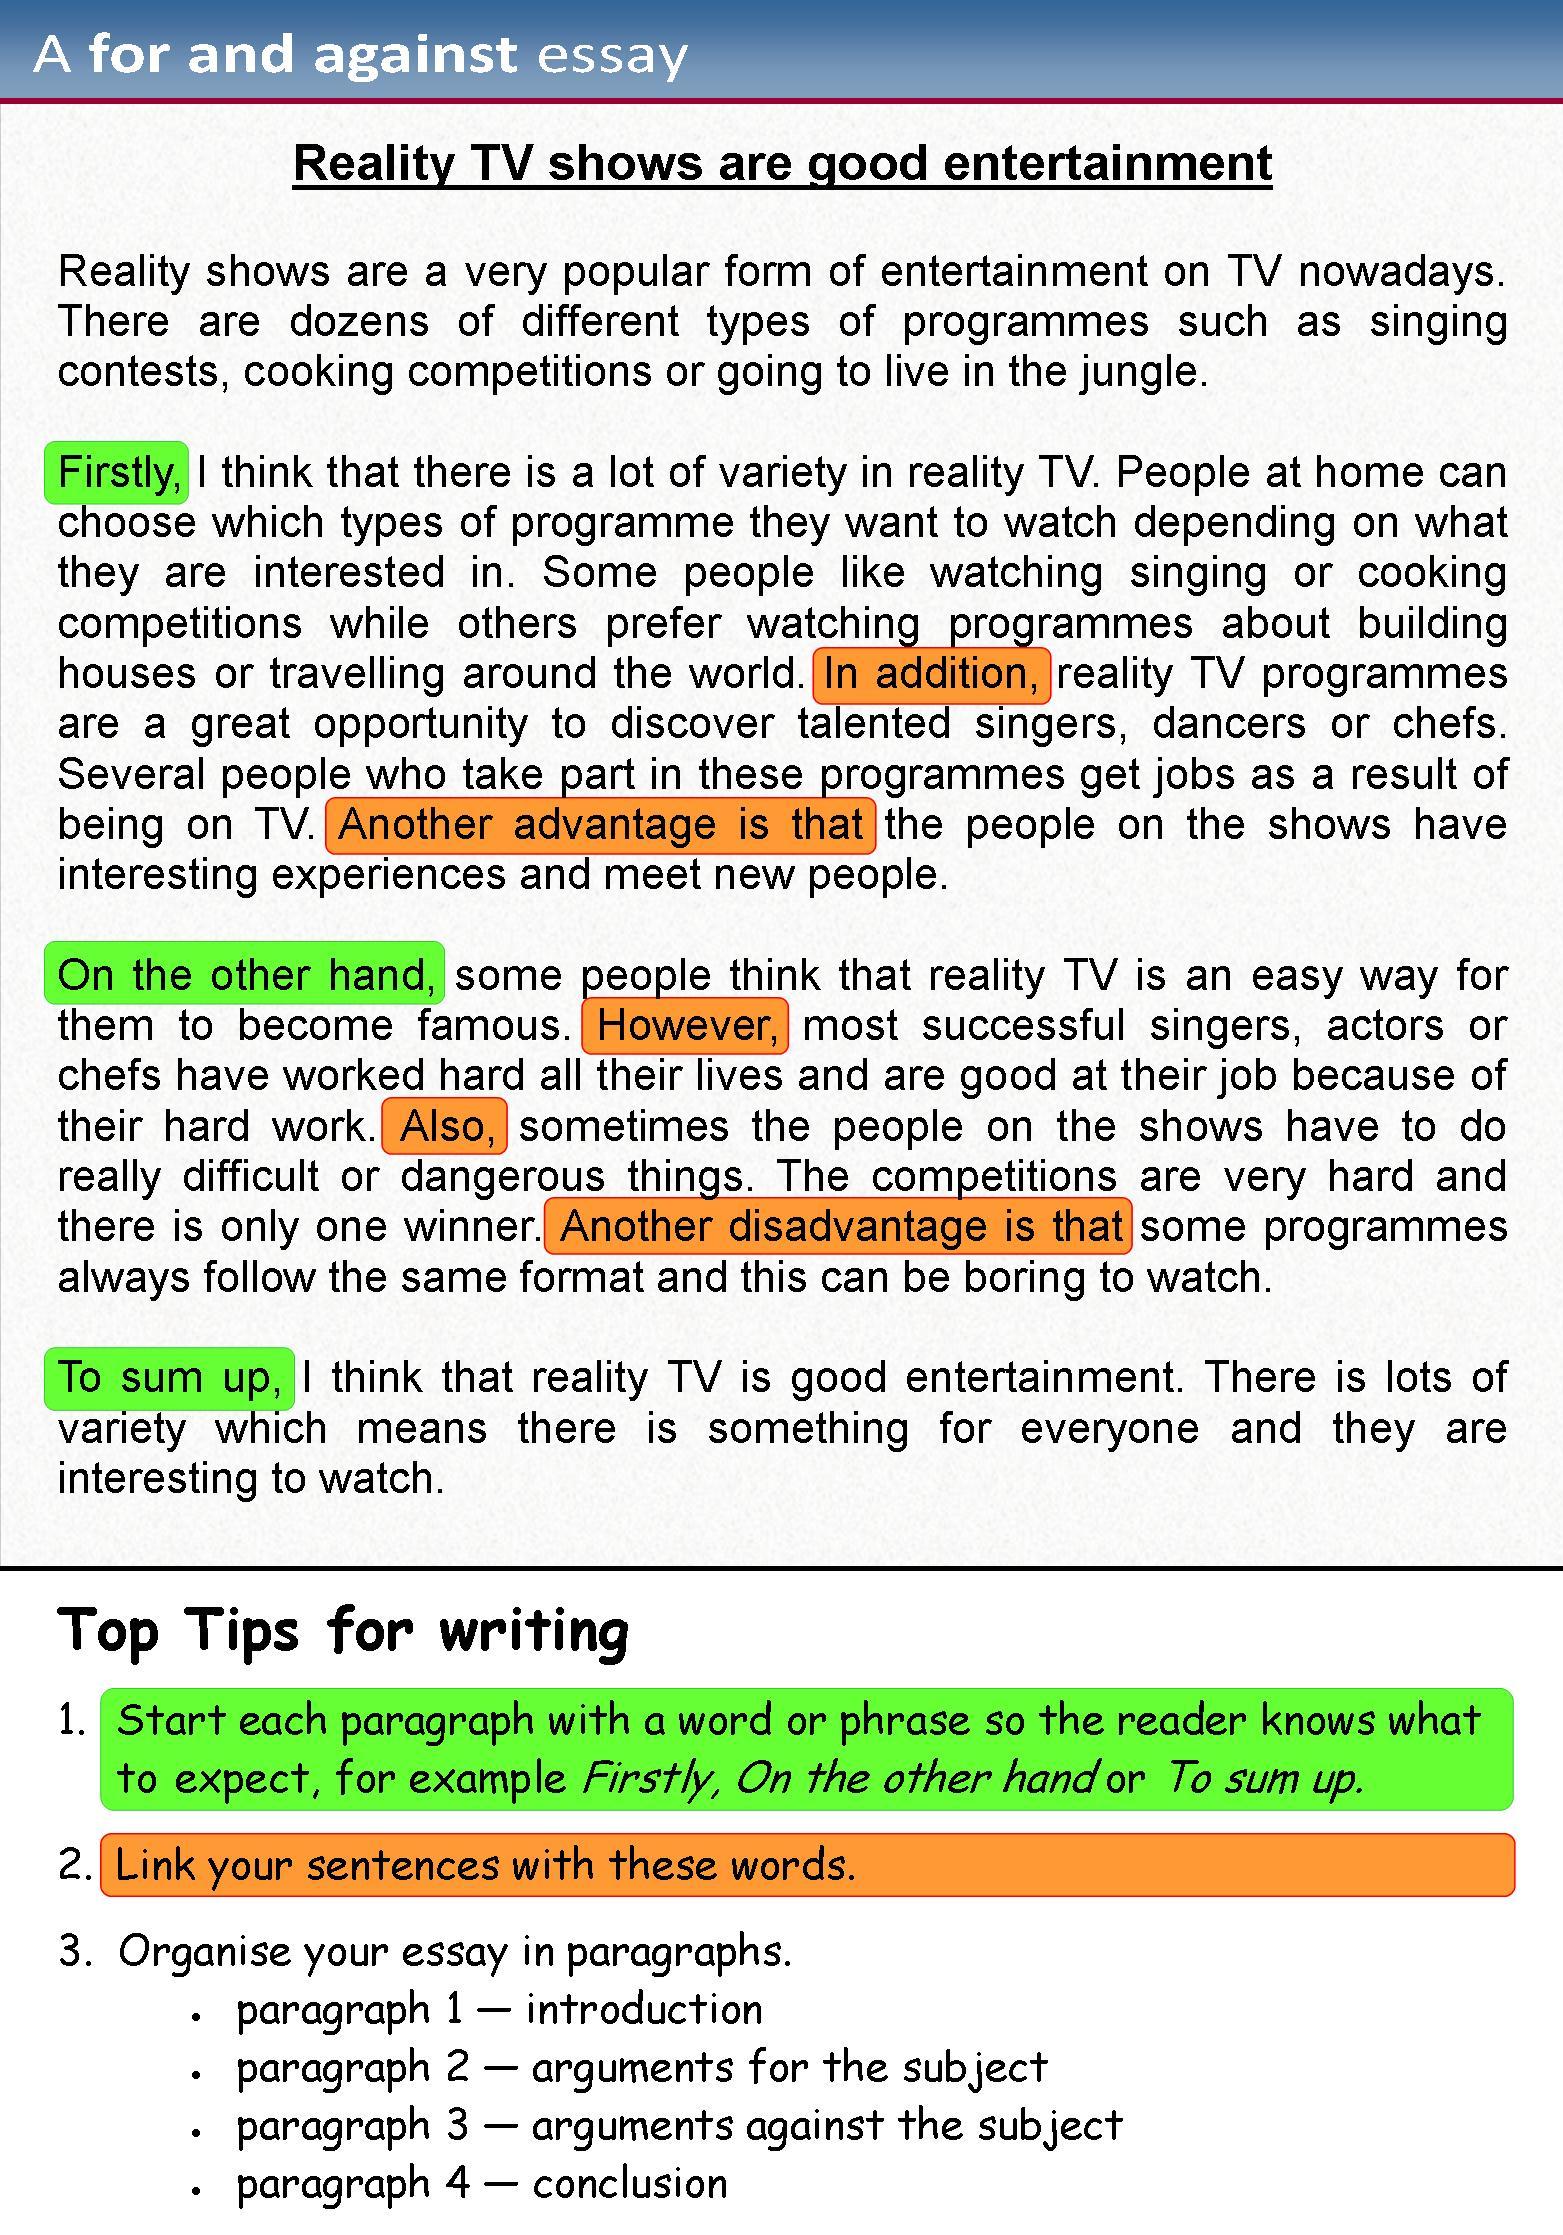 017 Grade English Essay Examples Example For Against 1 Wonderful 12 Narrative Provincial Exam Sample Manitoba Full